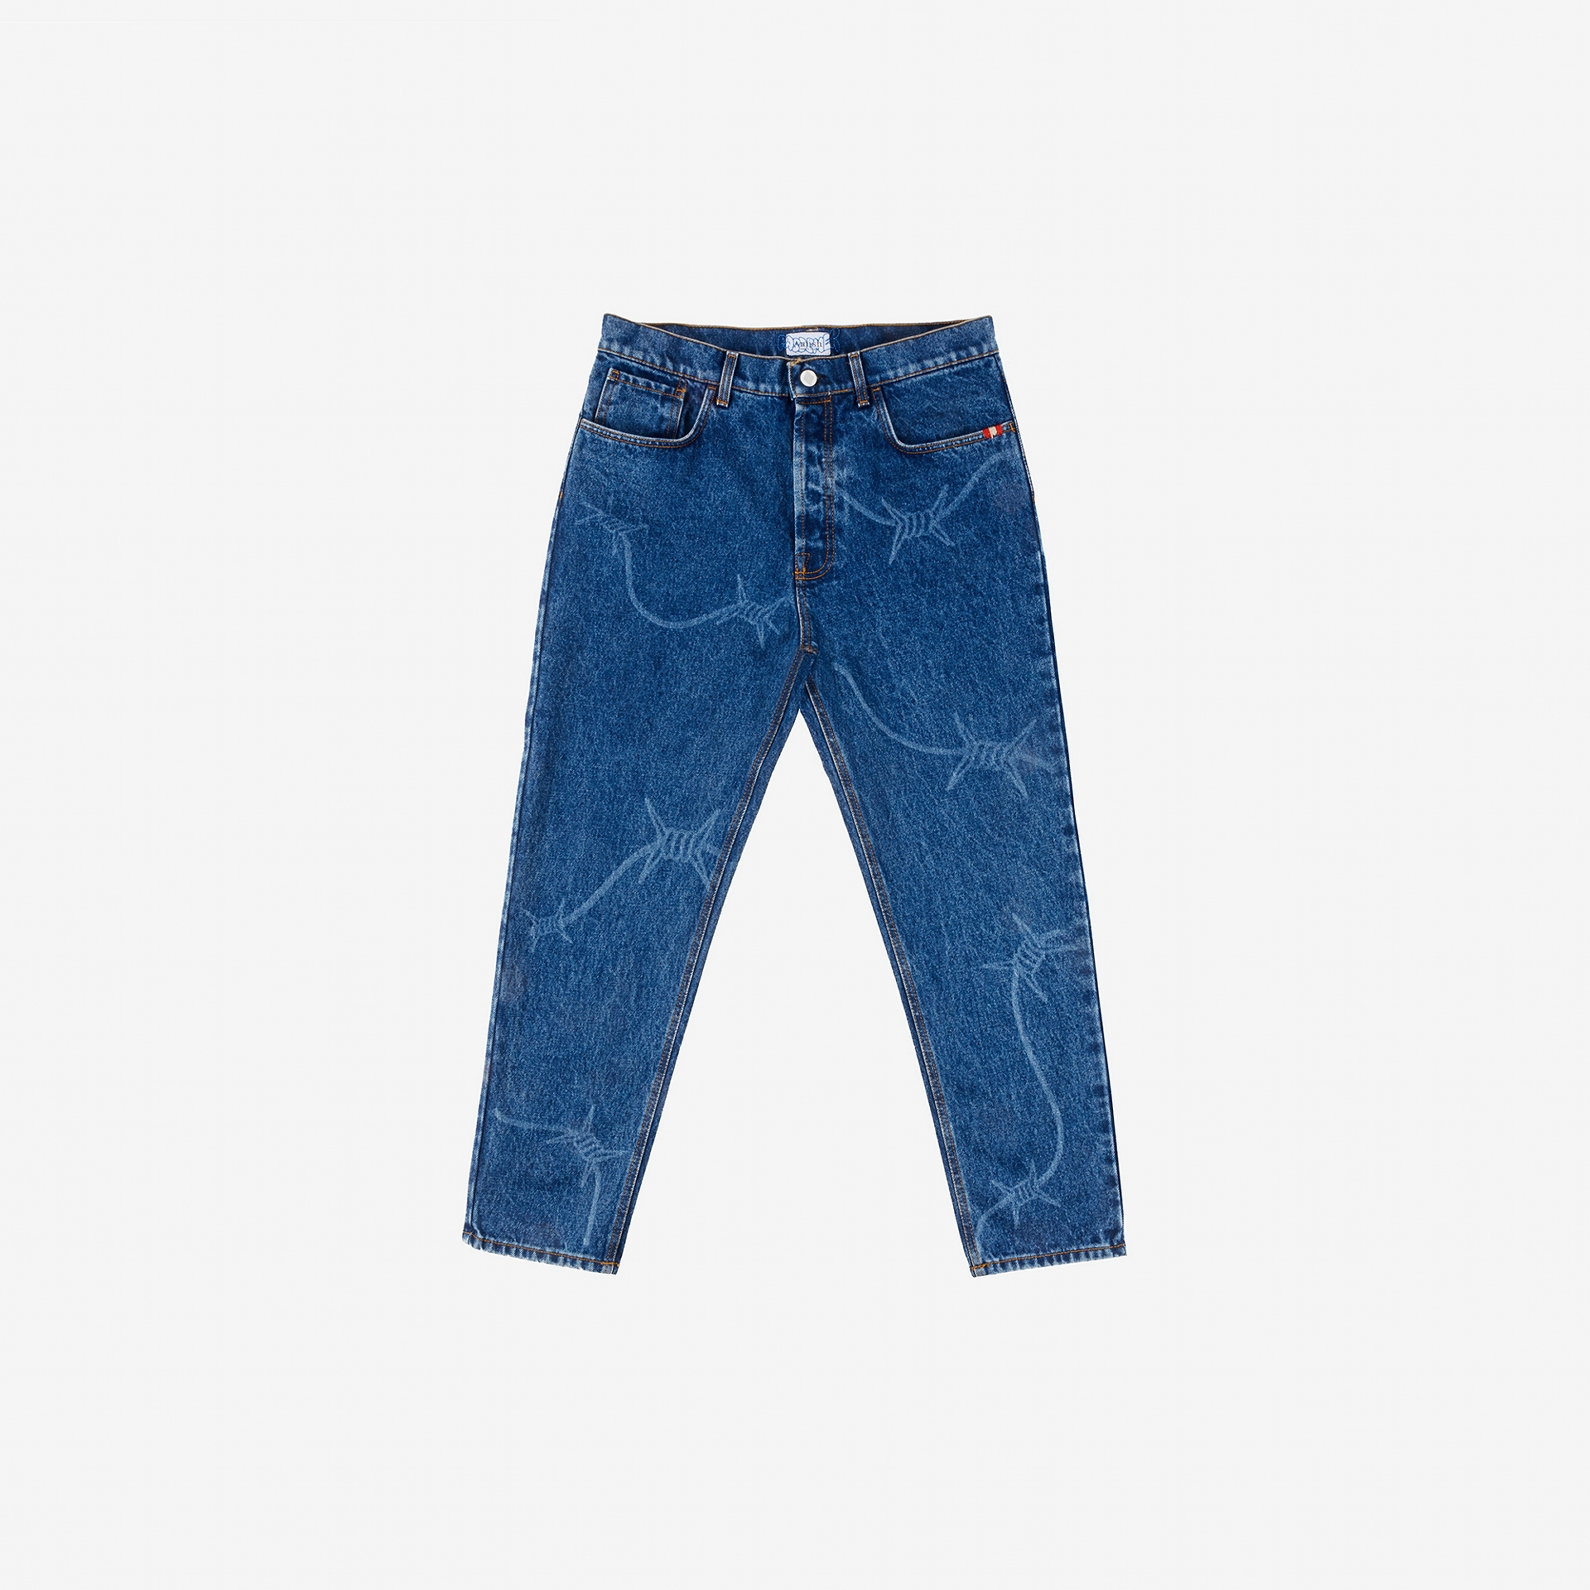 【PAS DE MER/パドゥメ】WIRE PANTS デニムパンツ / DARK BLUE